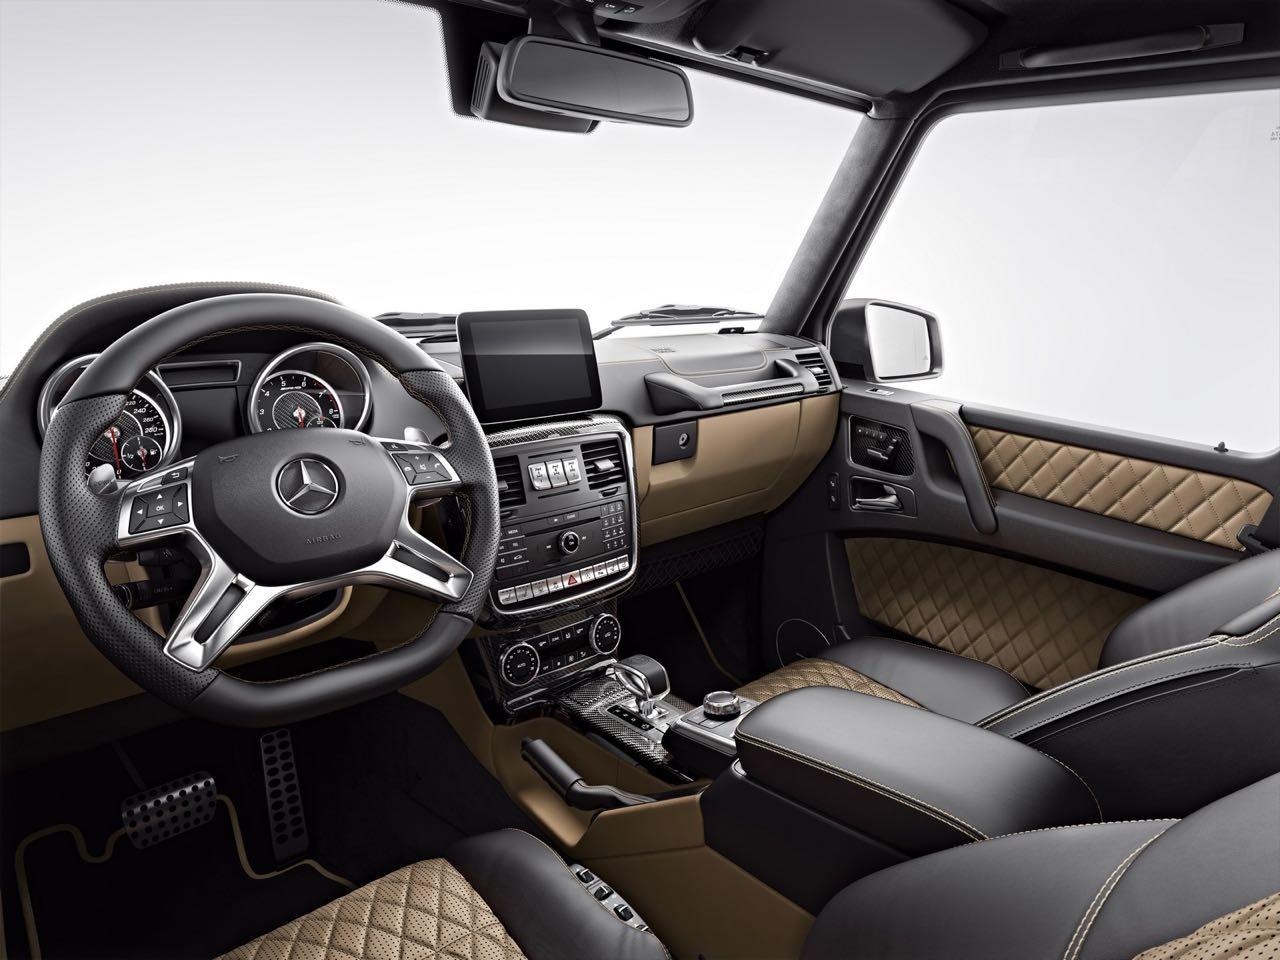 Mercedes-AMG G 63 Exclusive Edition interior